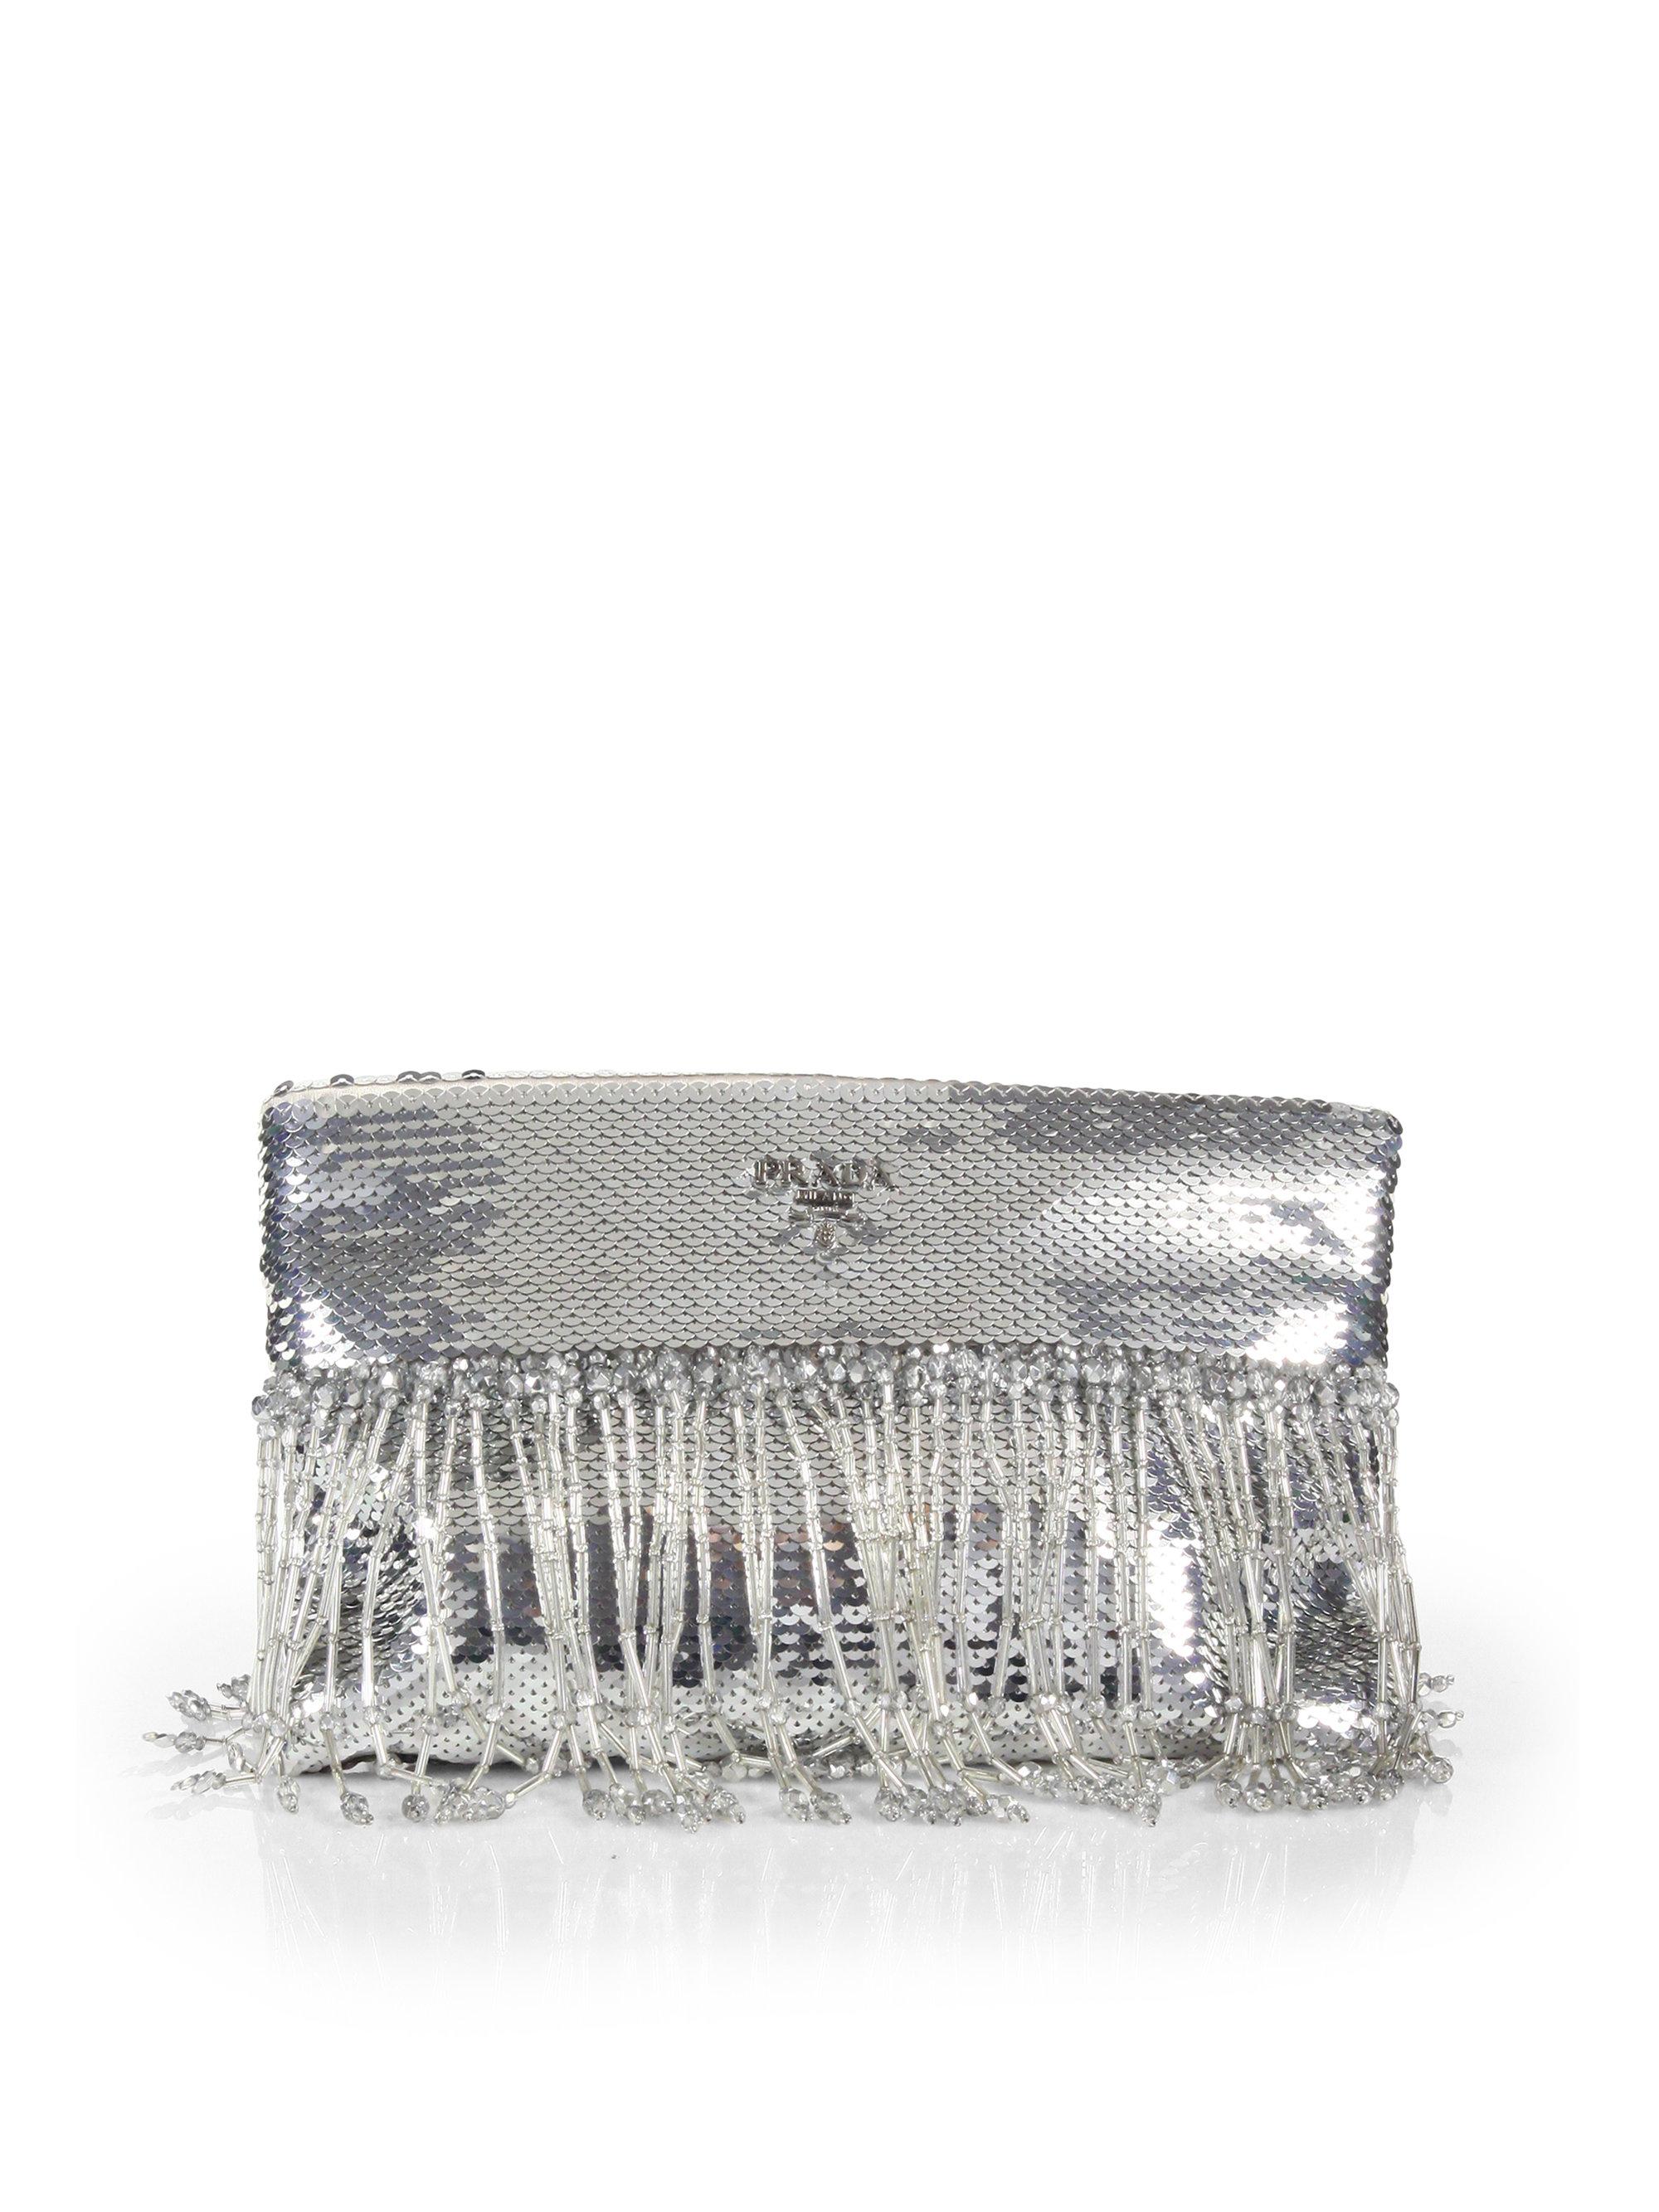 Prada Paillettes Fringe Clutch in Silver (ARGENTO-SILVER)   Lyst